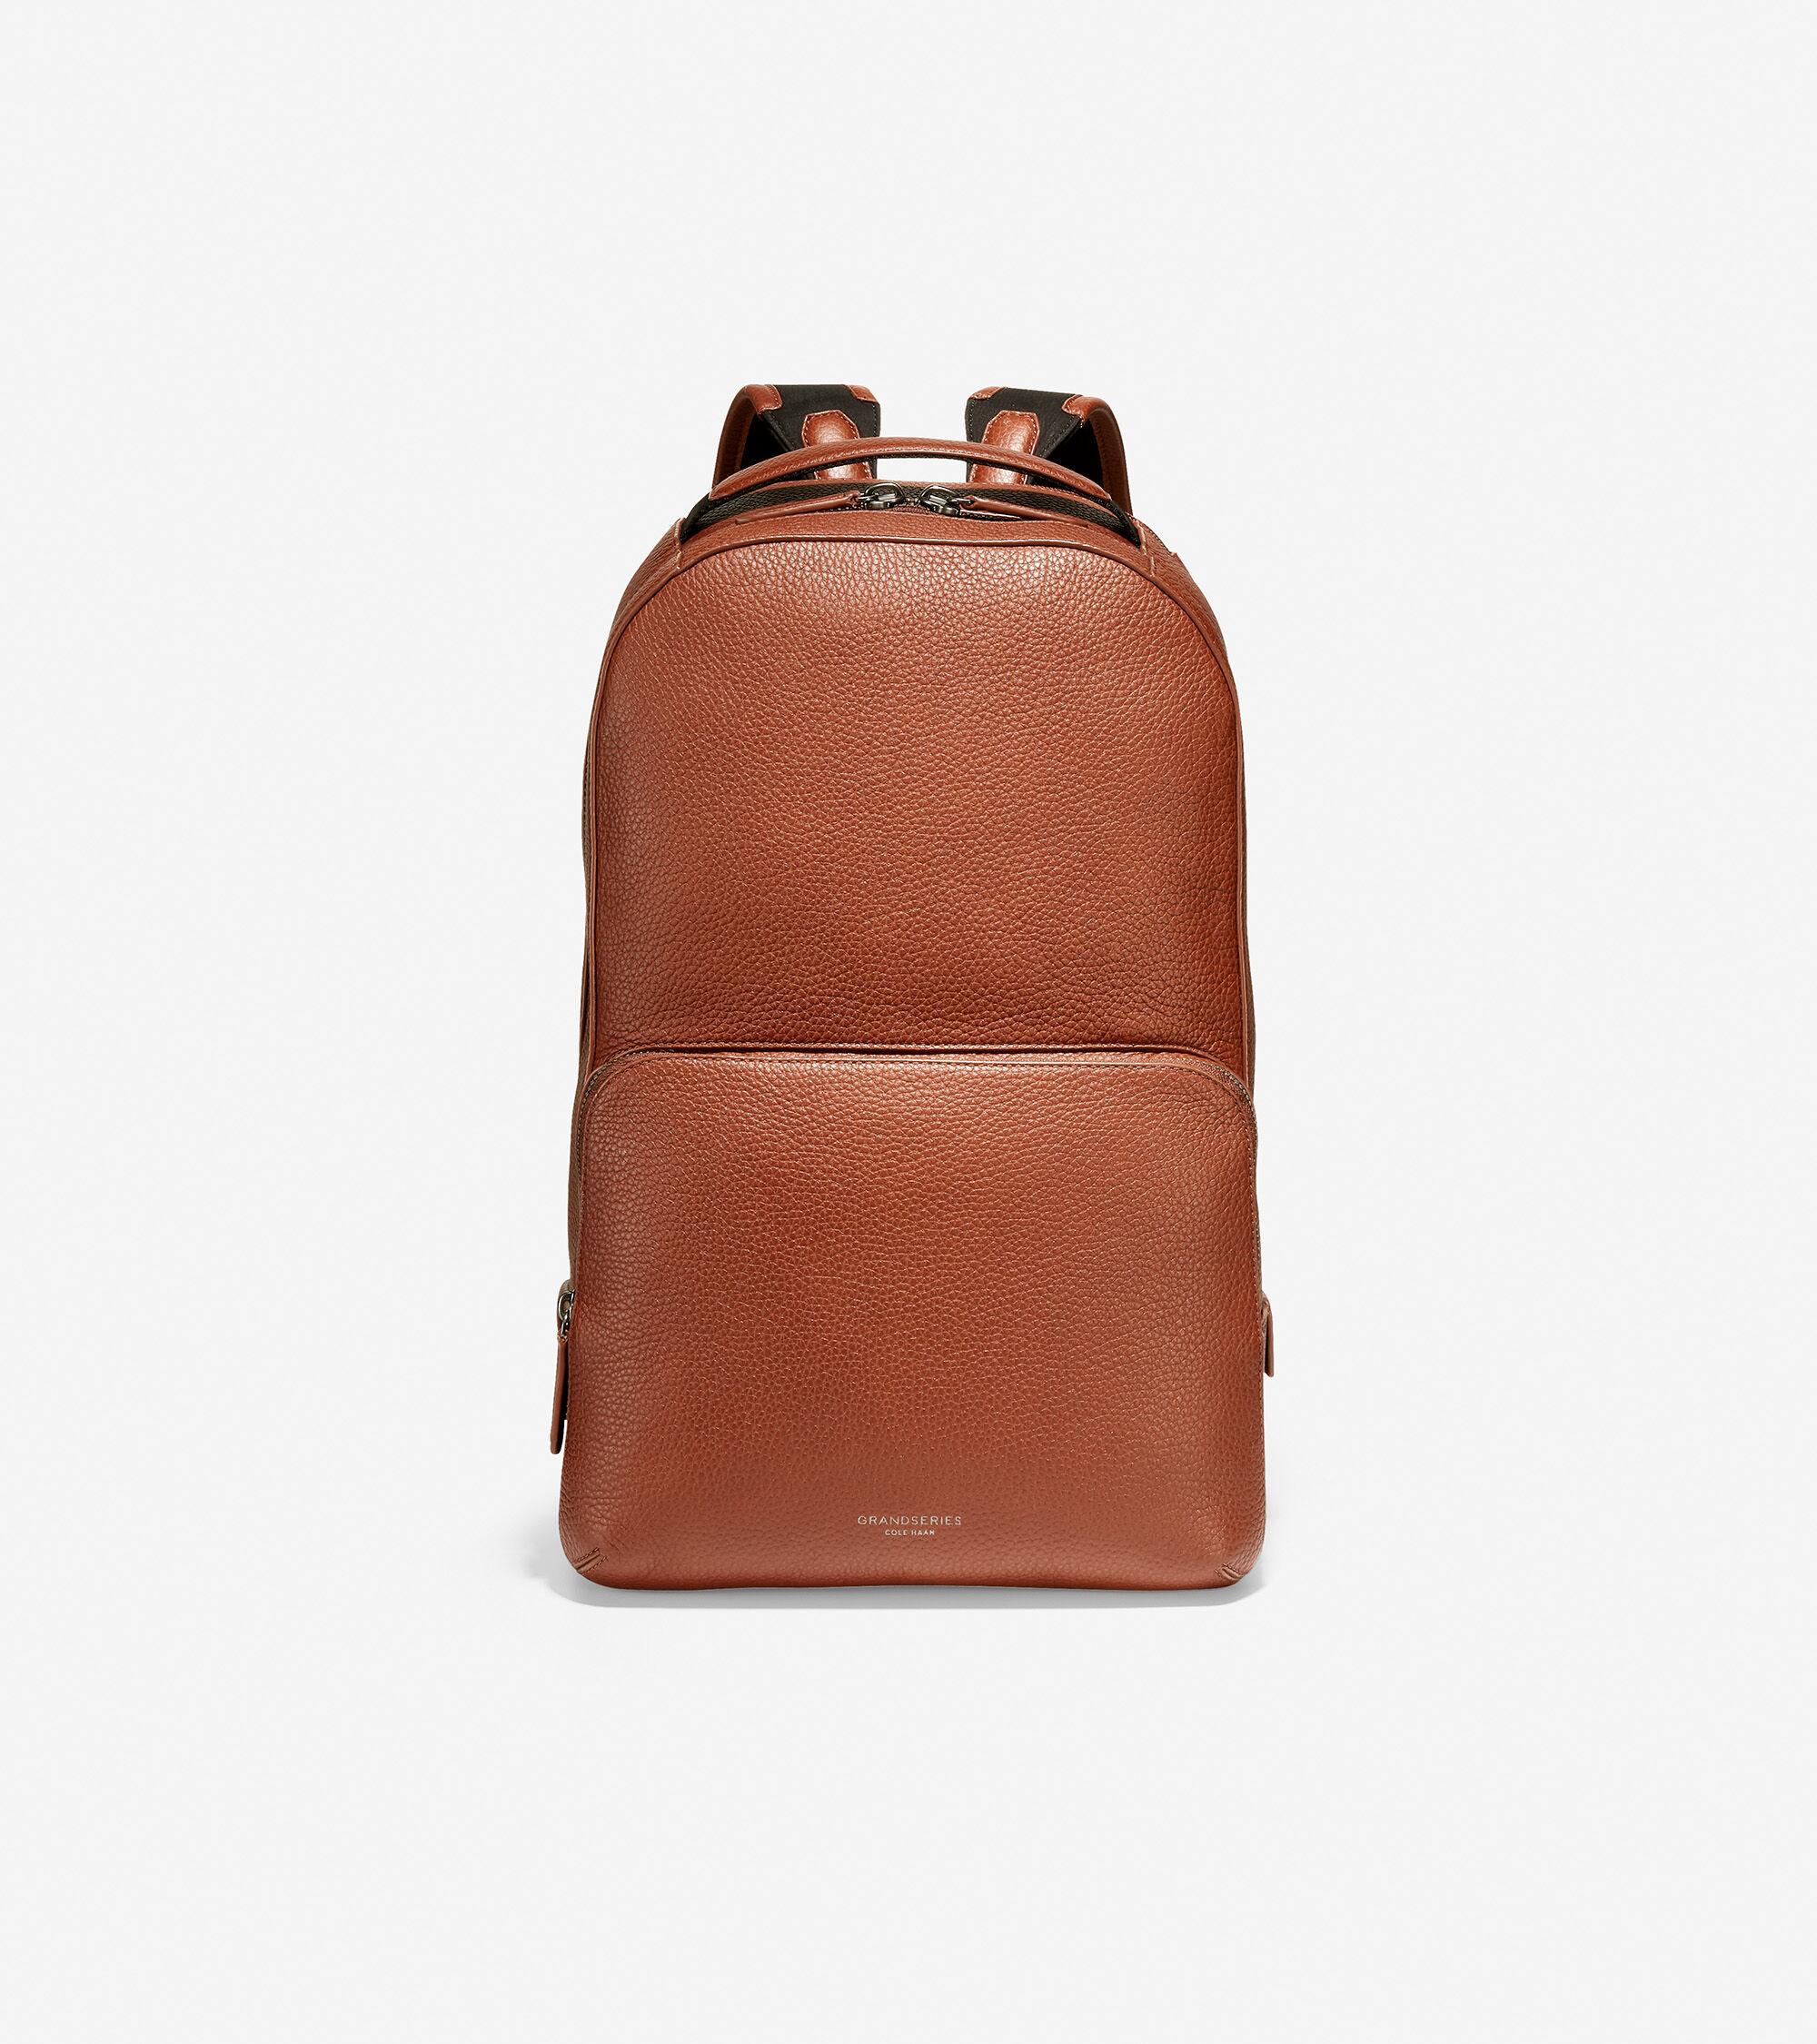 Cole Haan Men's GRANDSERIES Leather Backpack